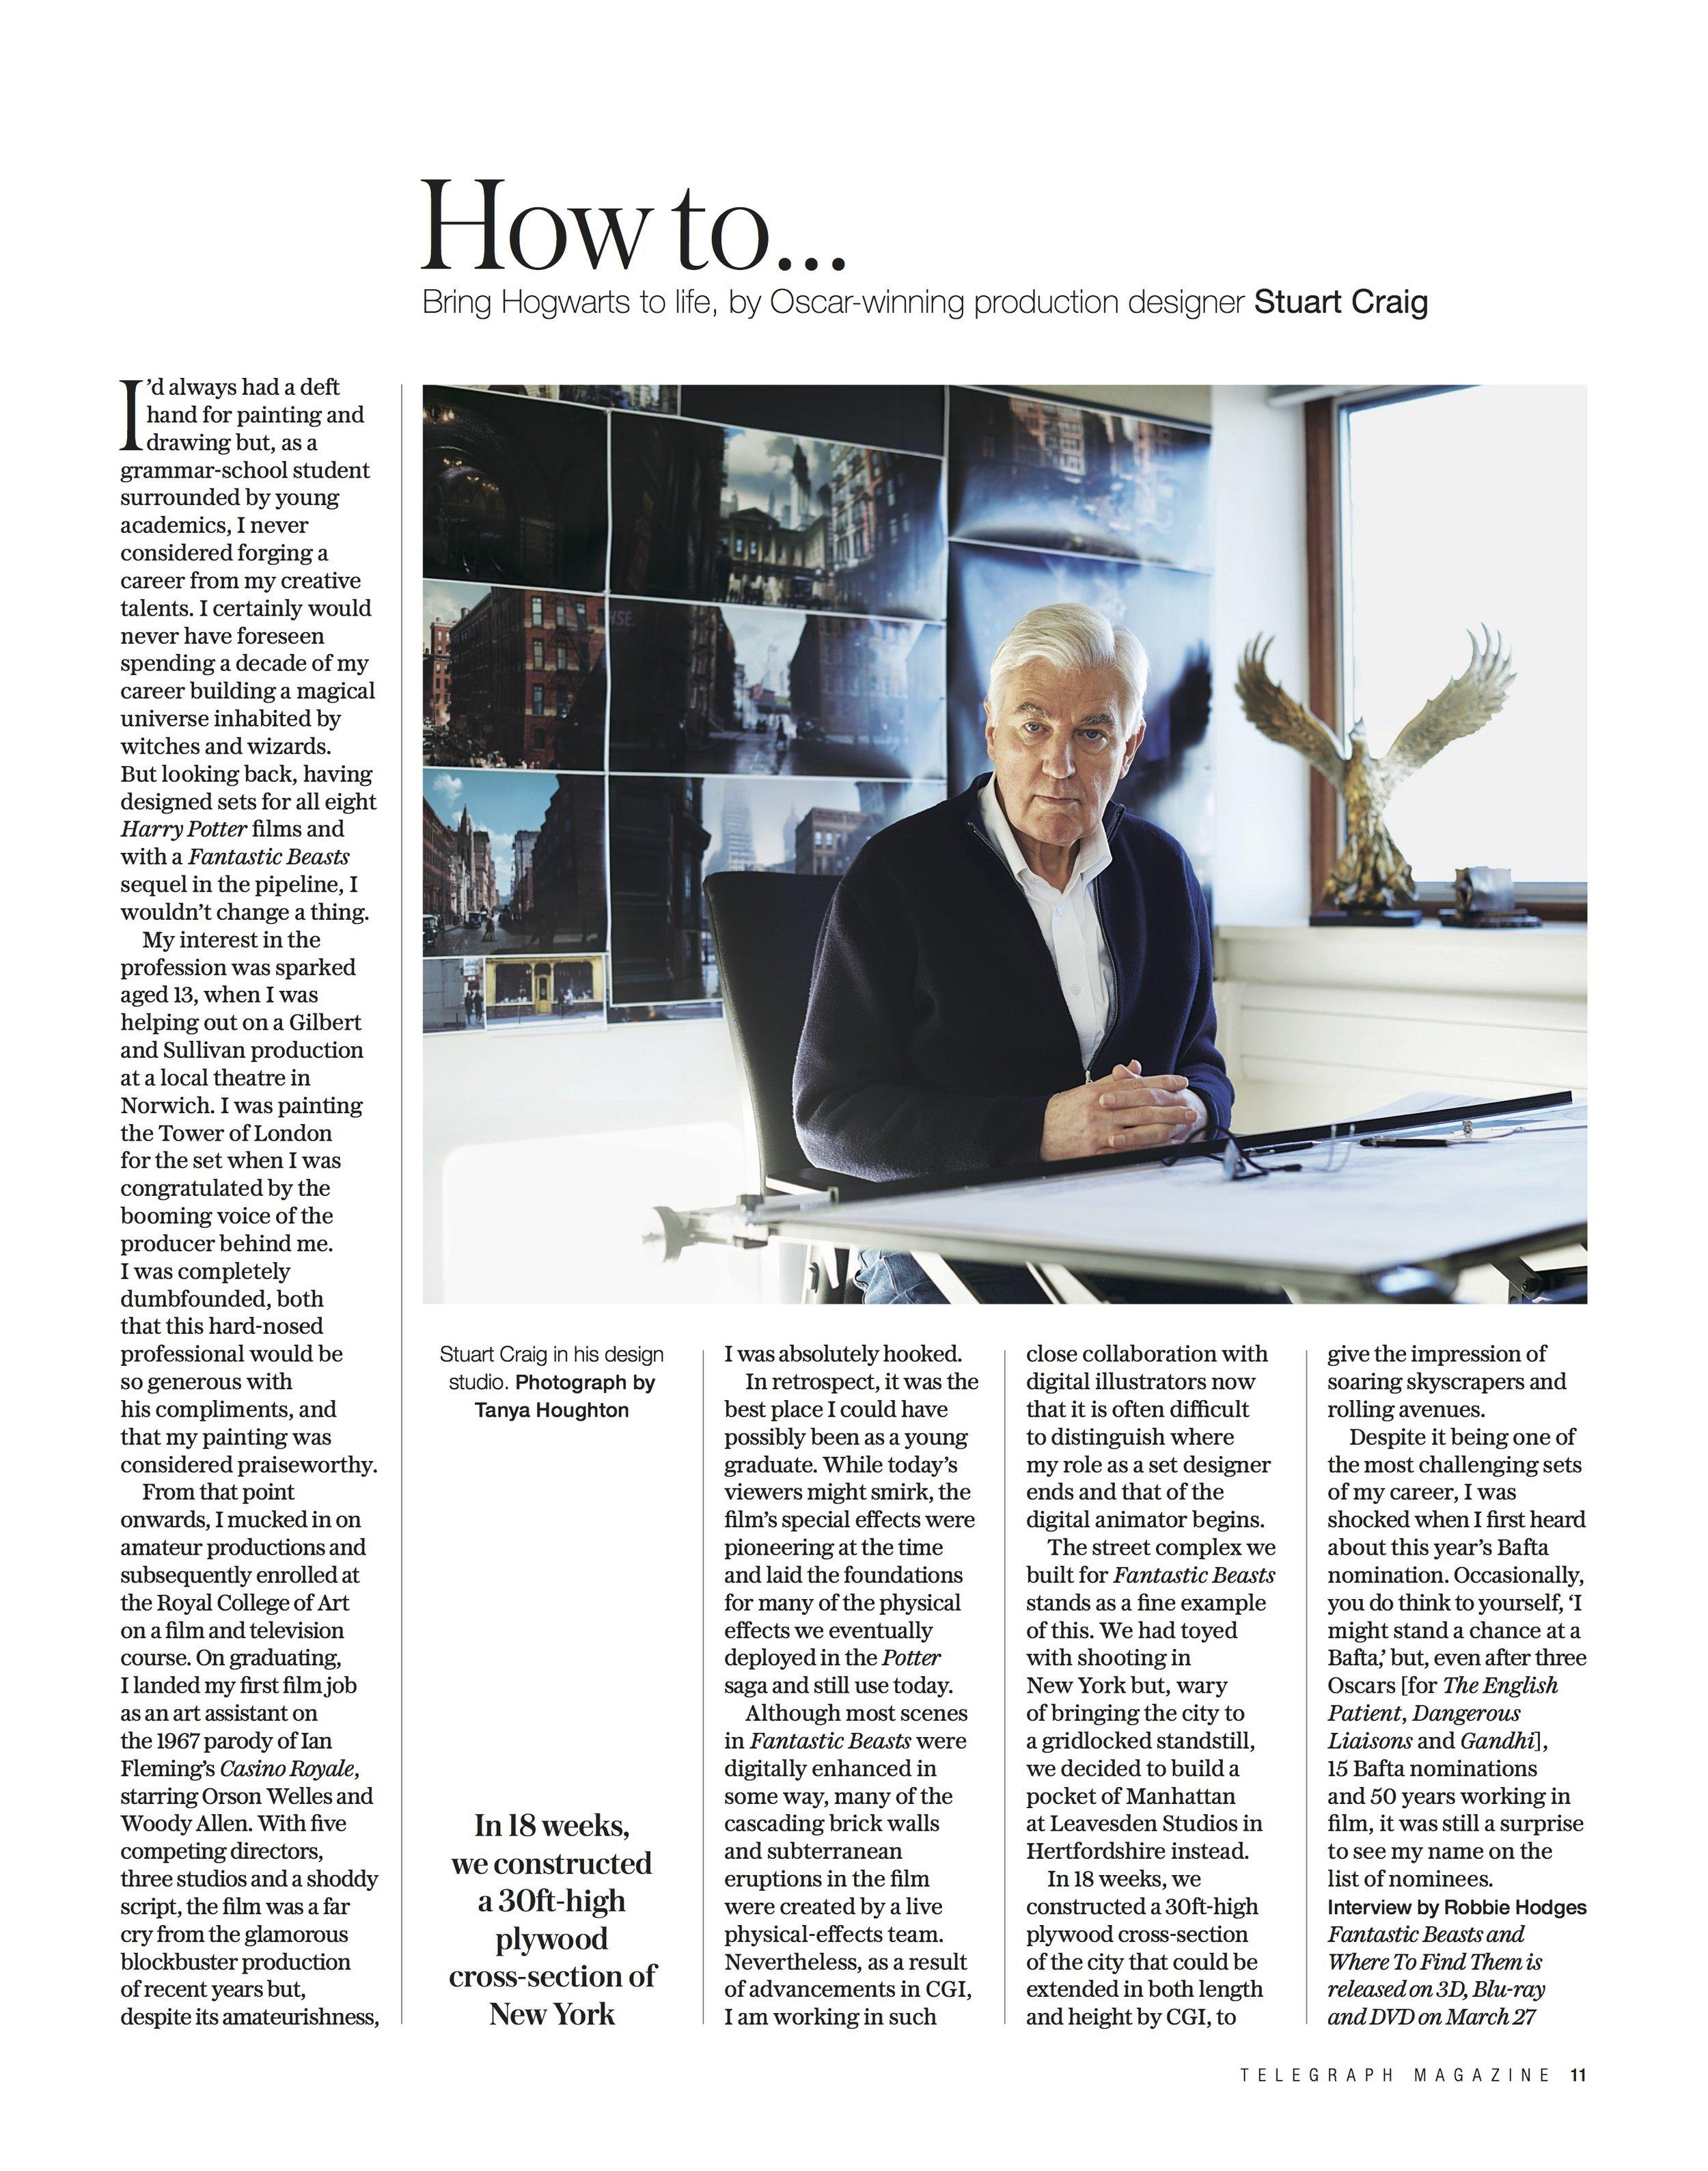 Daily+Telegraph+Magazine_04-02-2017_Main_1st_p11+copy.jpg